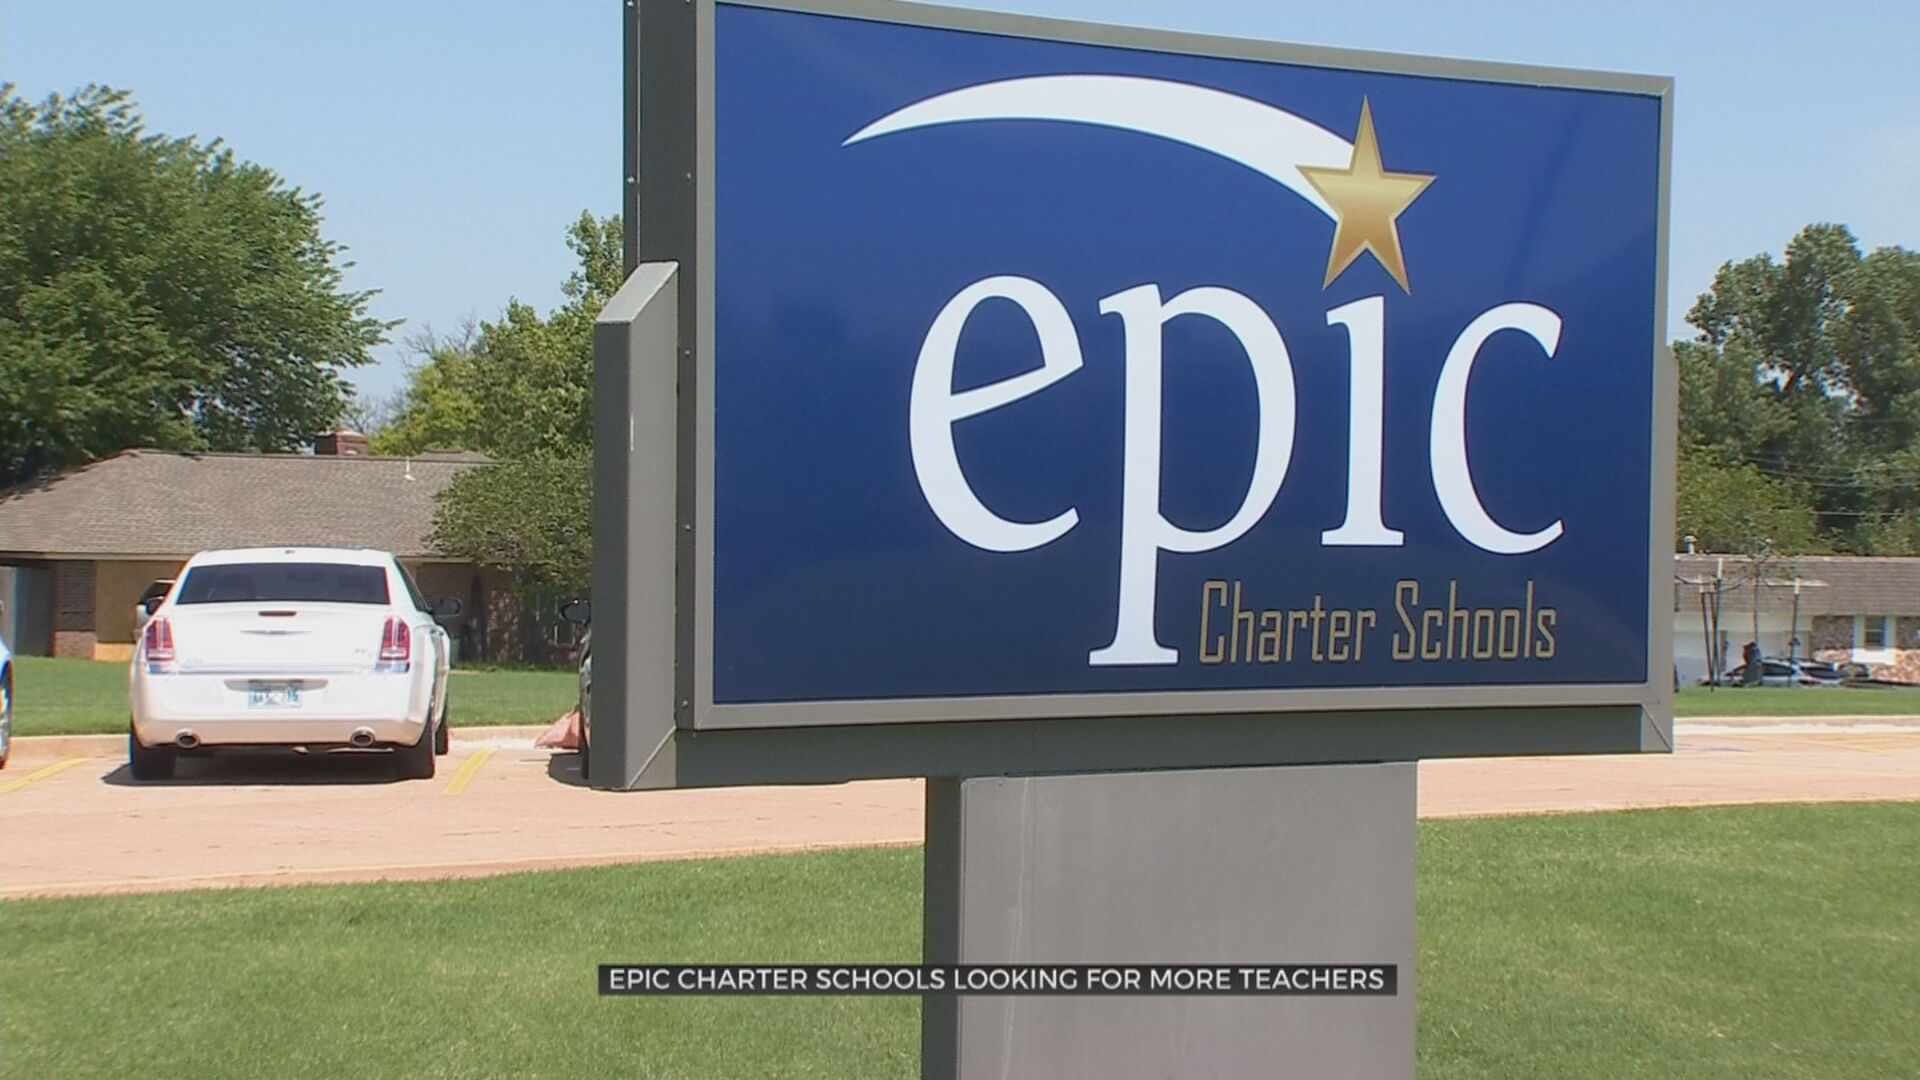 Epic Charter Schools Seeking More Teachers As Enrollment Rises